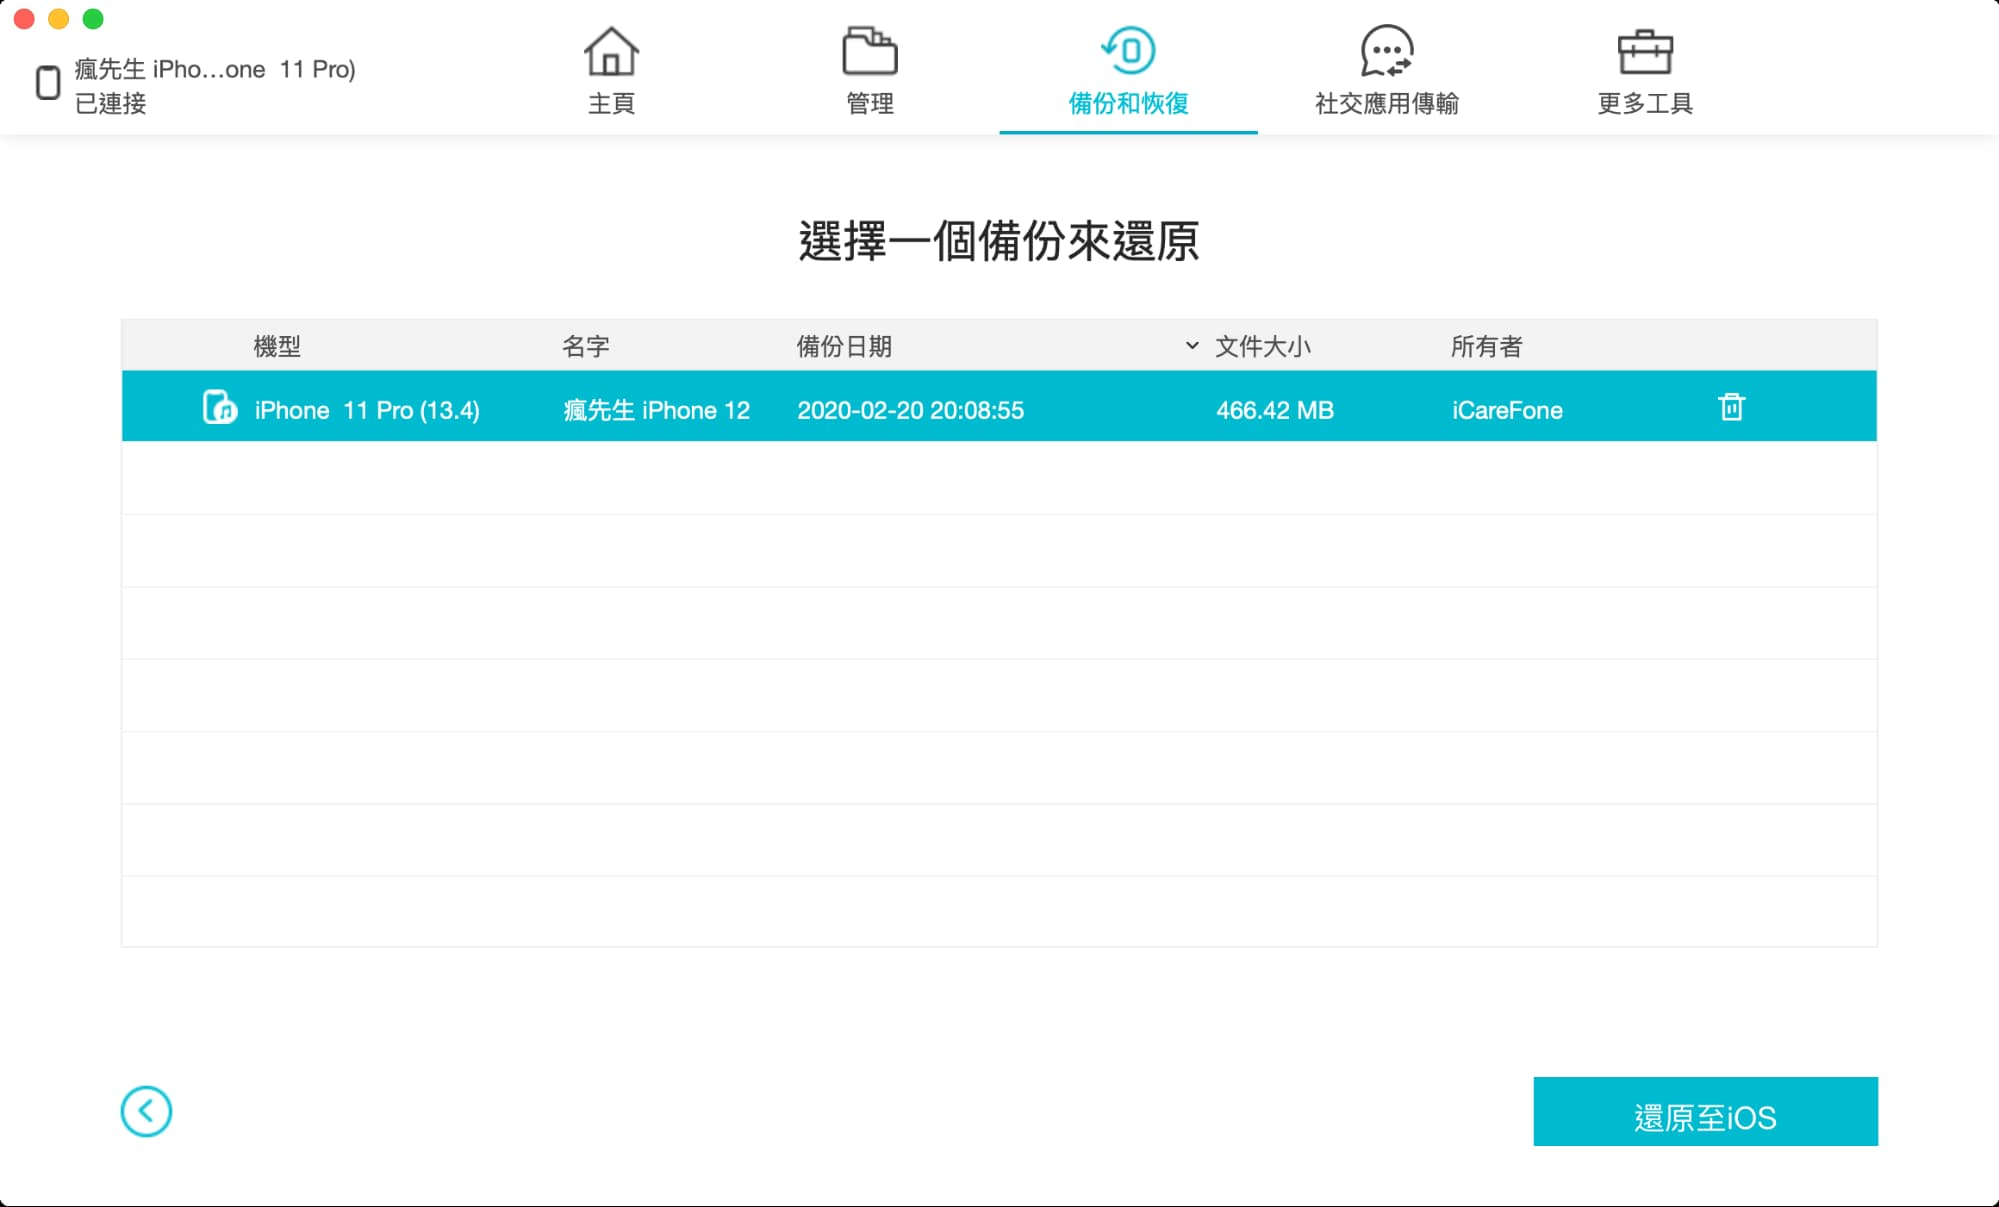 LINE聊天記錄備份轉移 iOS 同步神器 Tenorshare iCareFone - 瘋先生